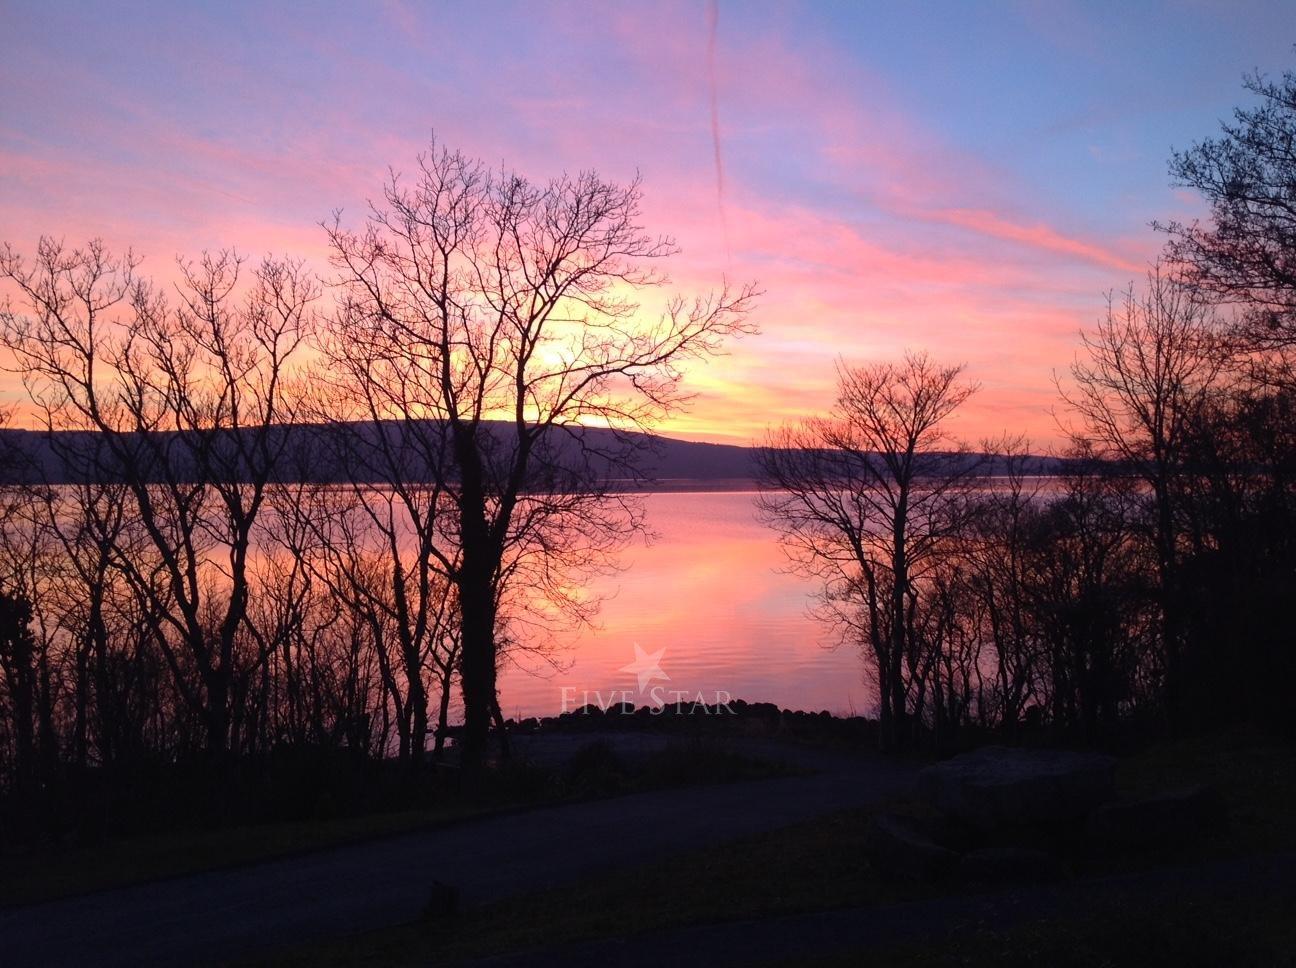 Ceo na Locha photo 5